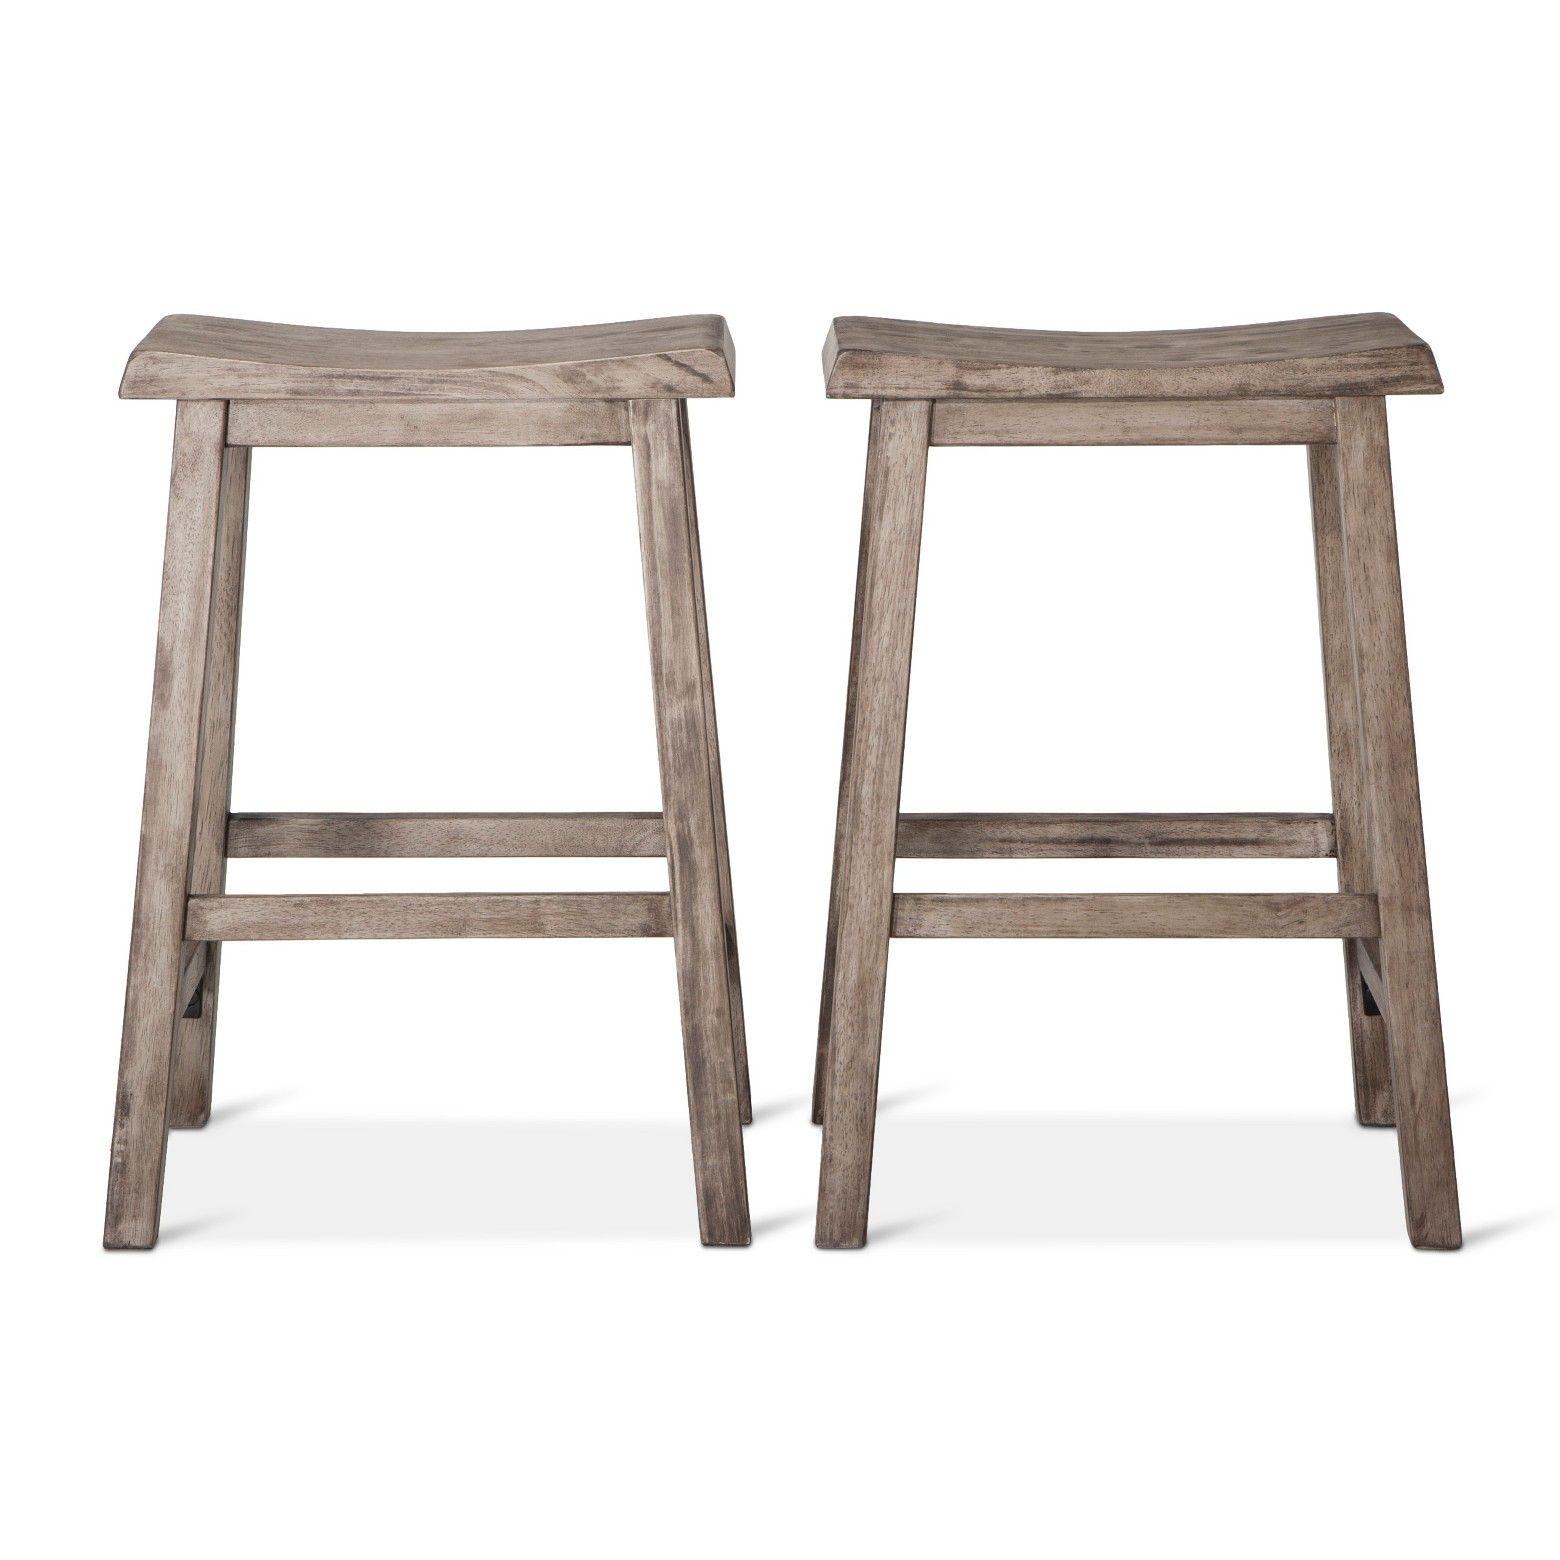 2pk 24 Trenton Counter Stool Dark Gray Wash Threshold Bar Stools Counter Stools Shabby Chic Table And Chairs